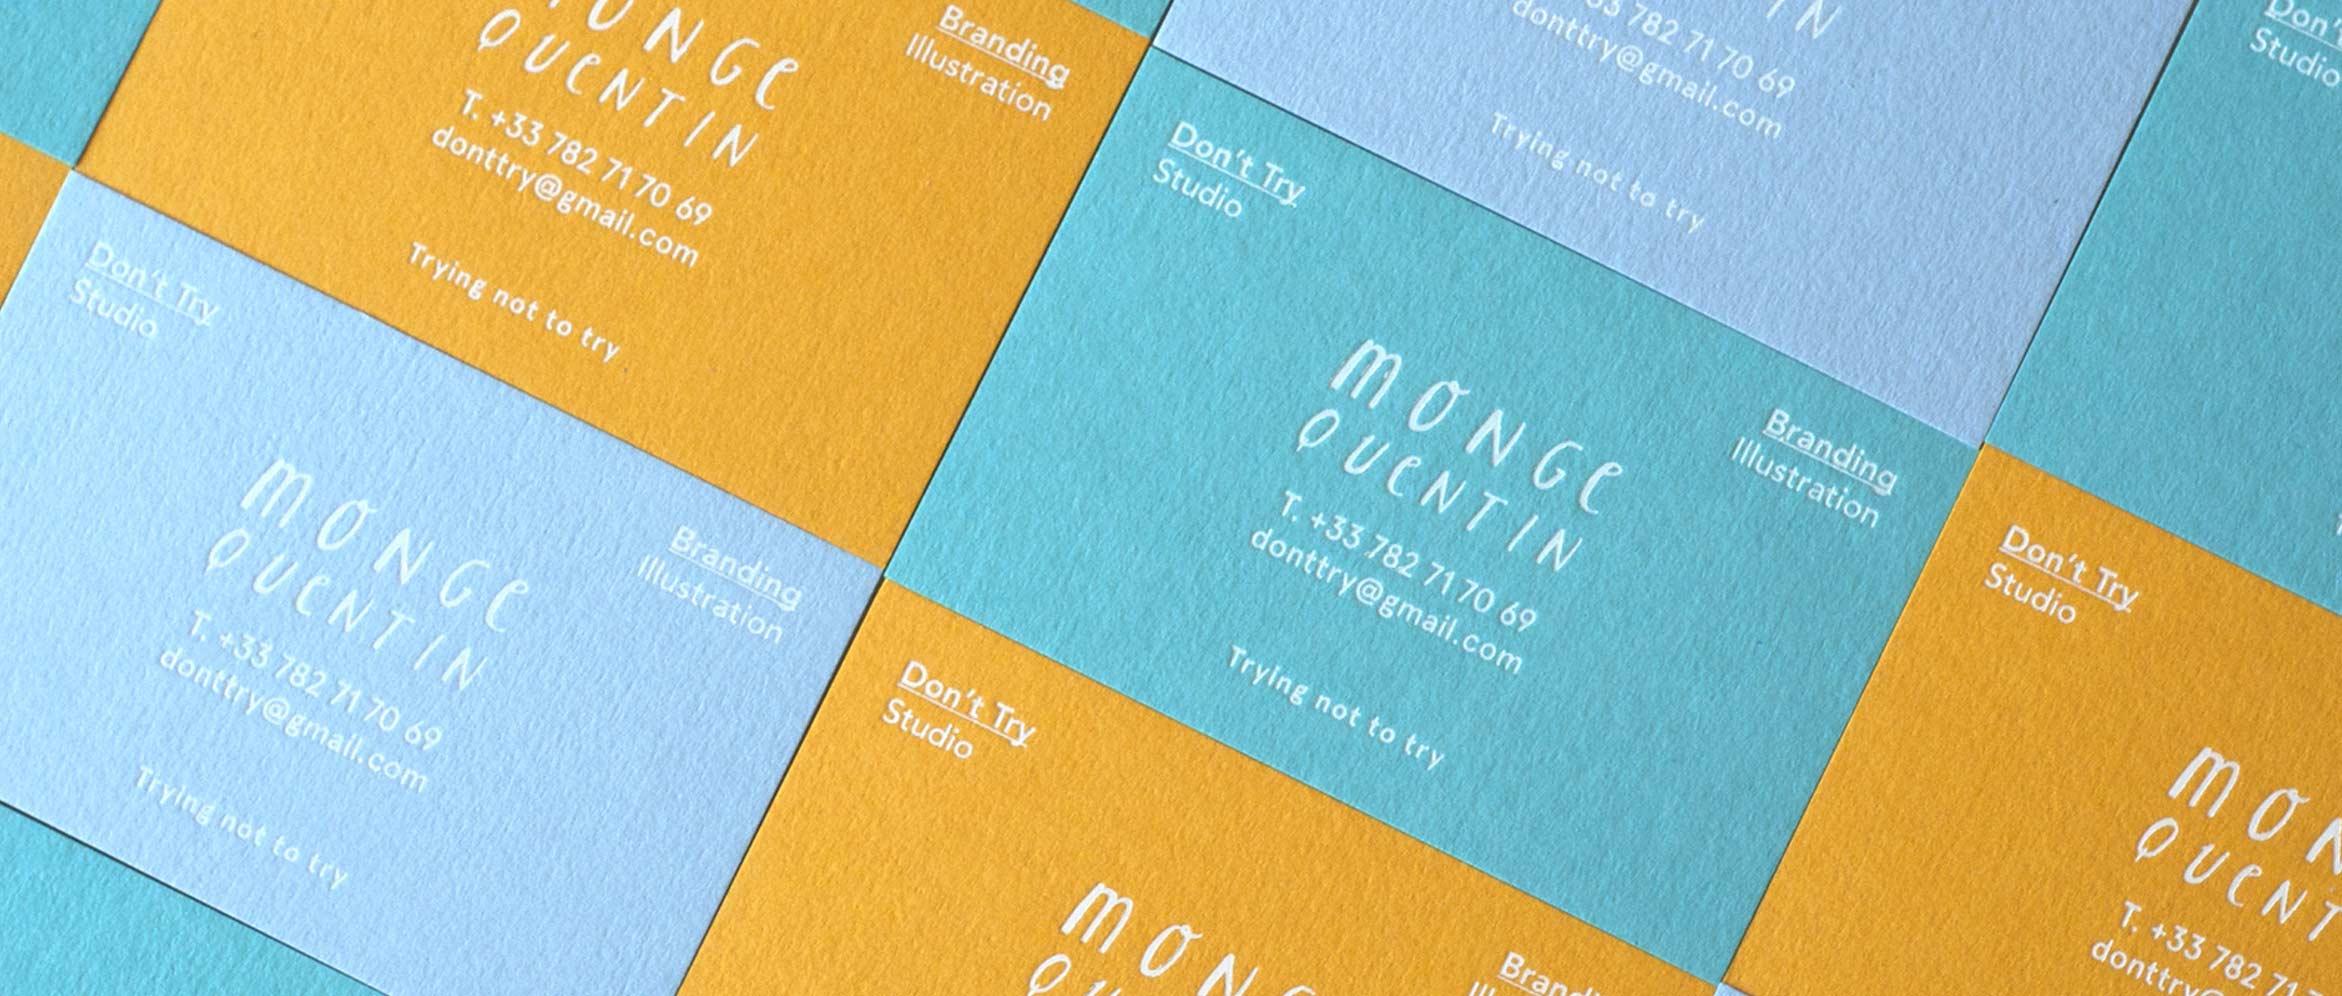 Real tea bag business cards jukebox print 3 ply letterpress and foil cards colourmoves